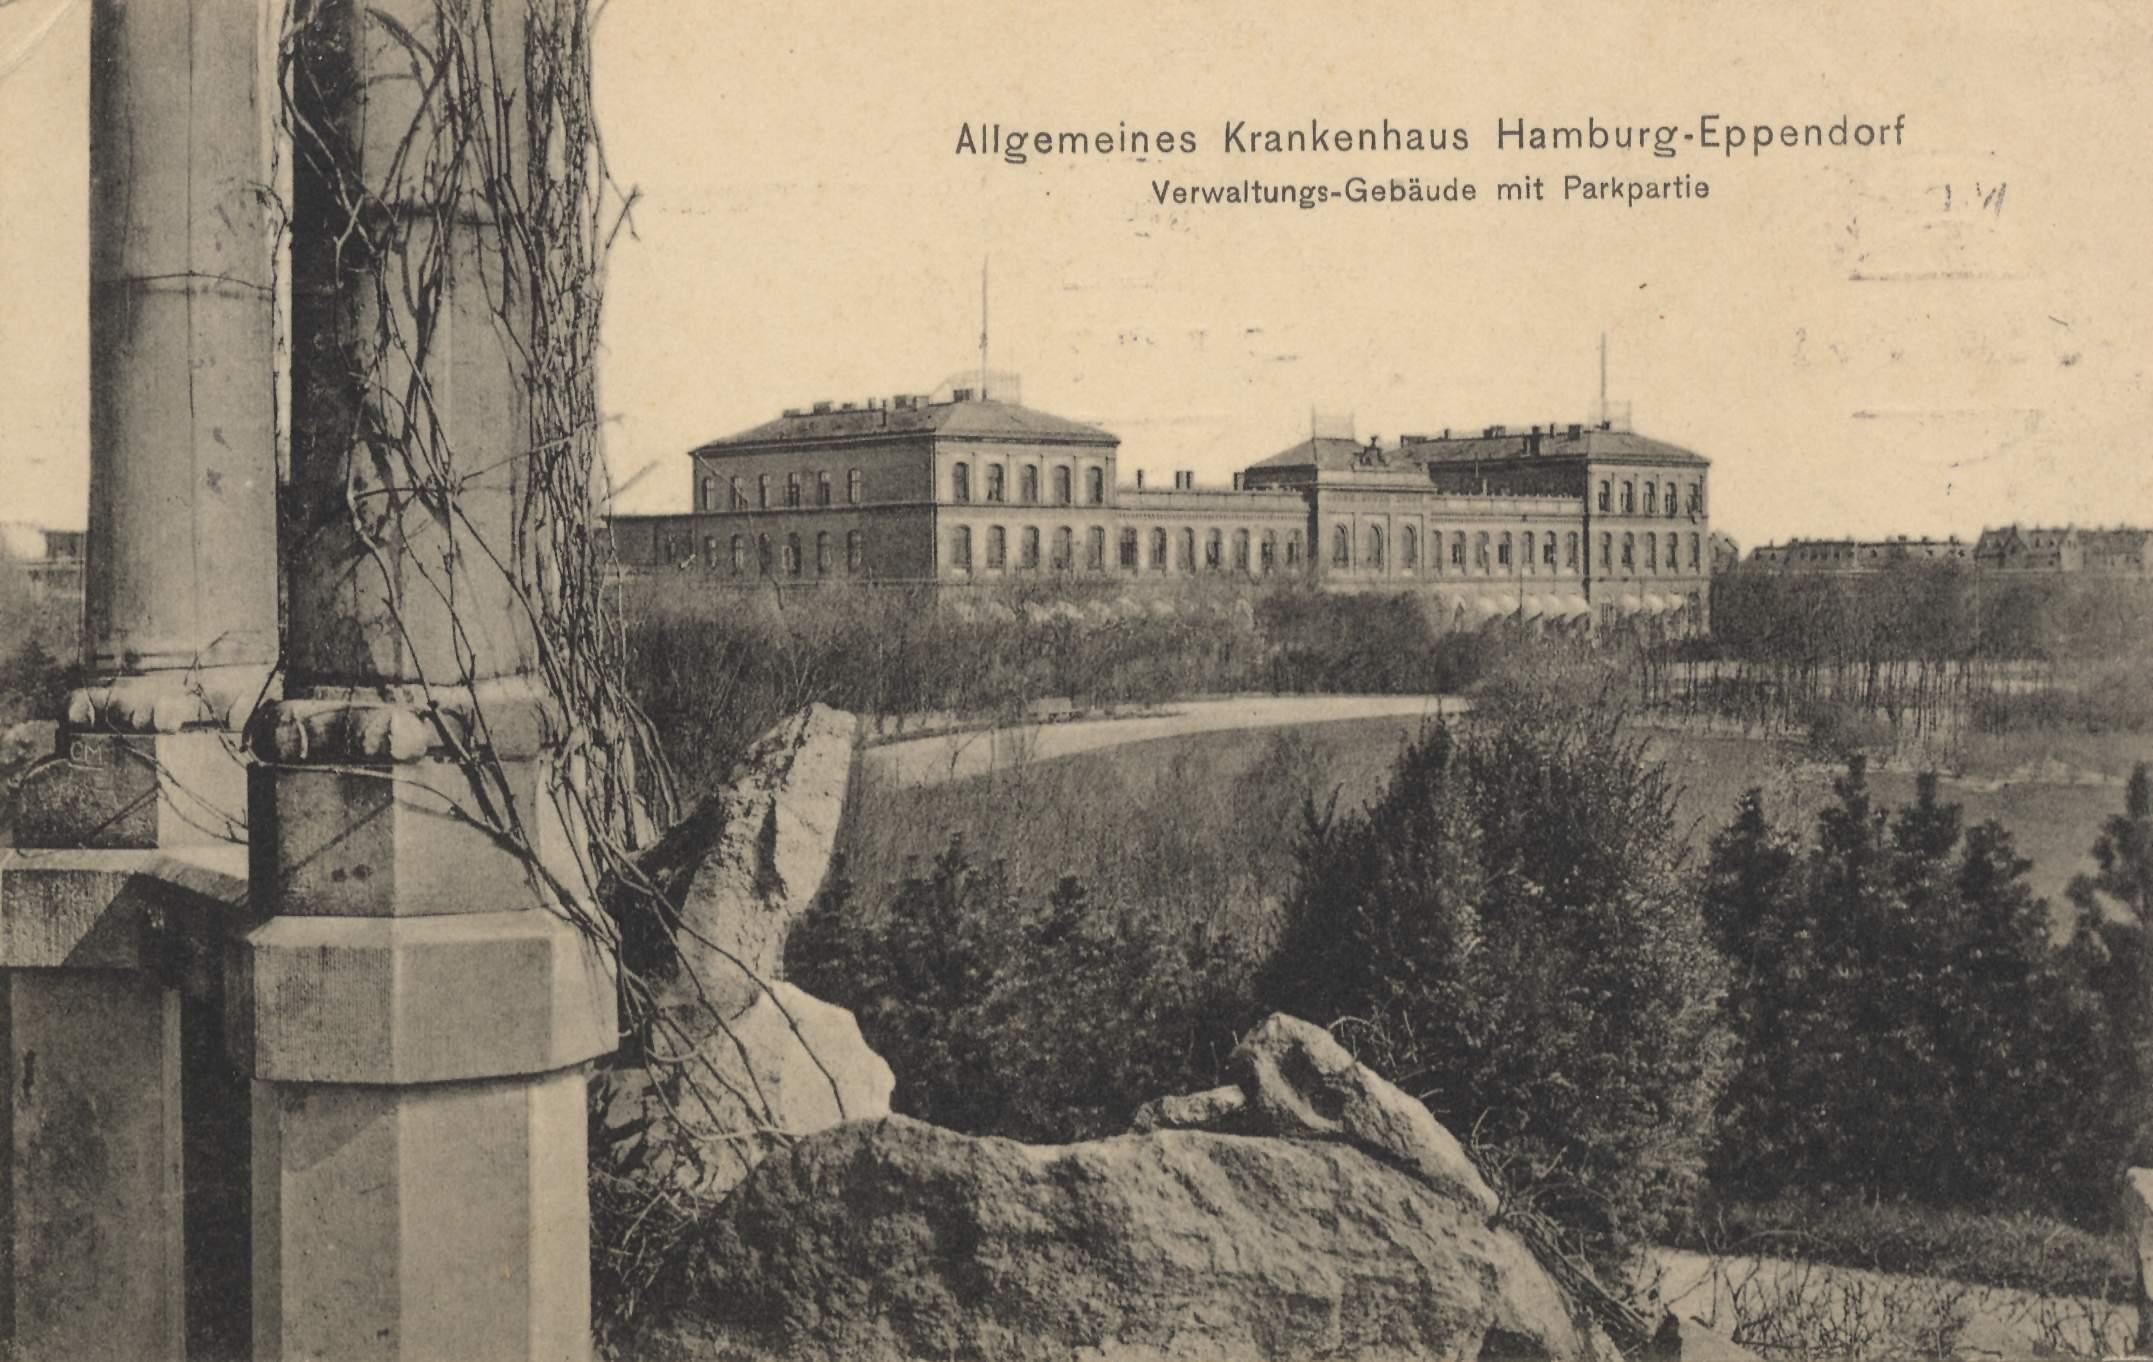 Eppendorf Krankenhaus Hamburg